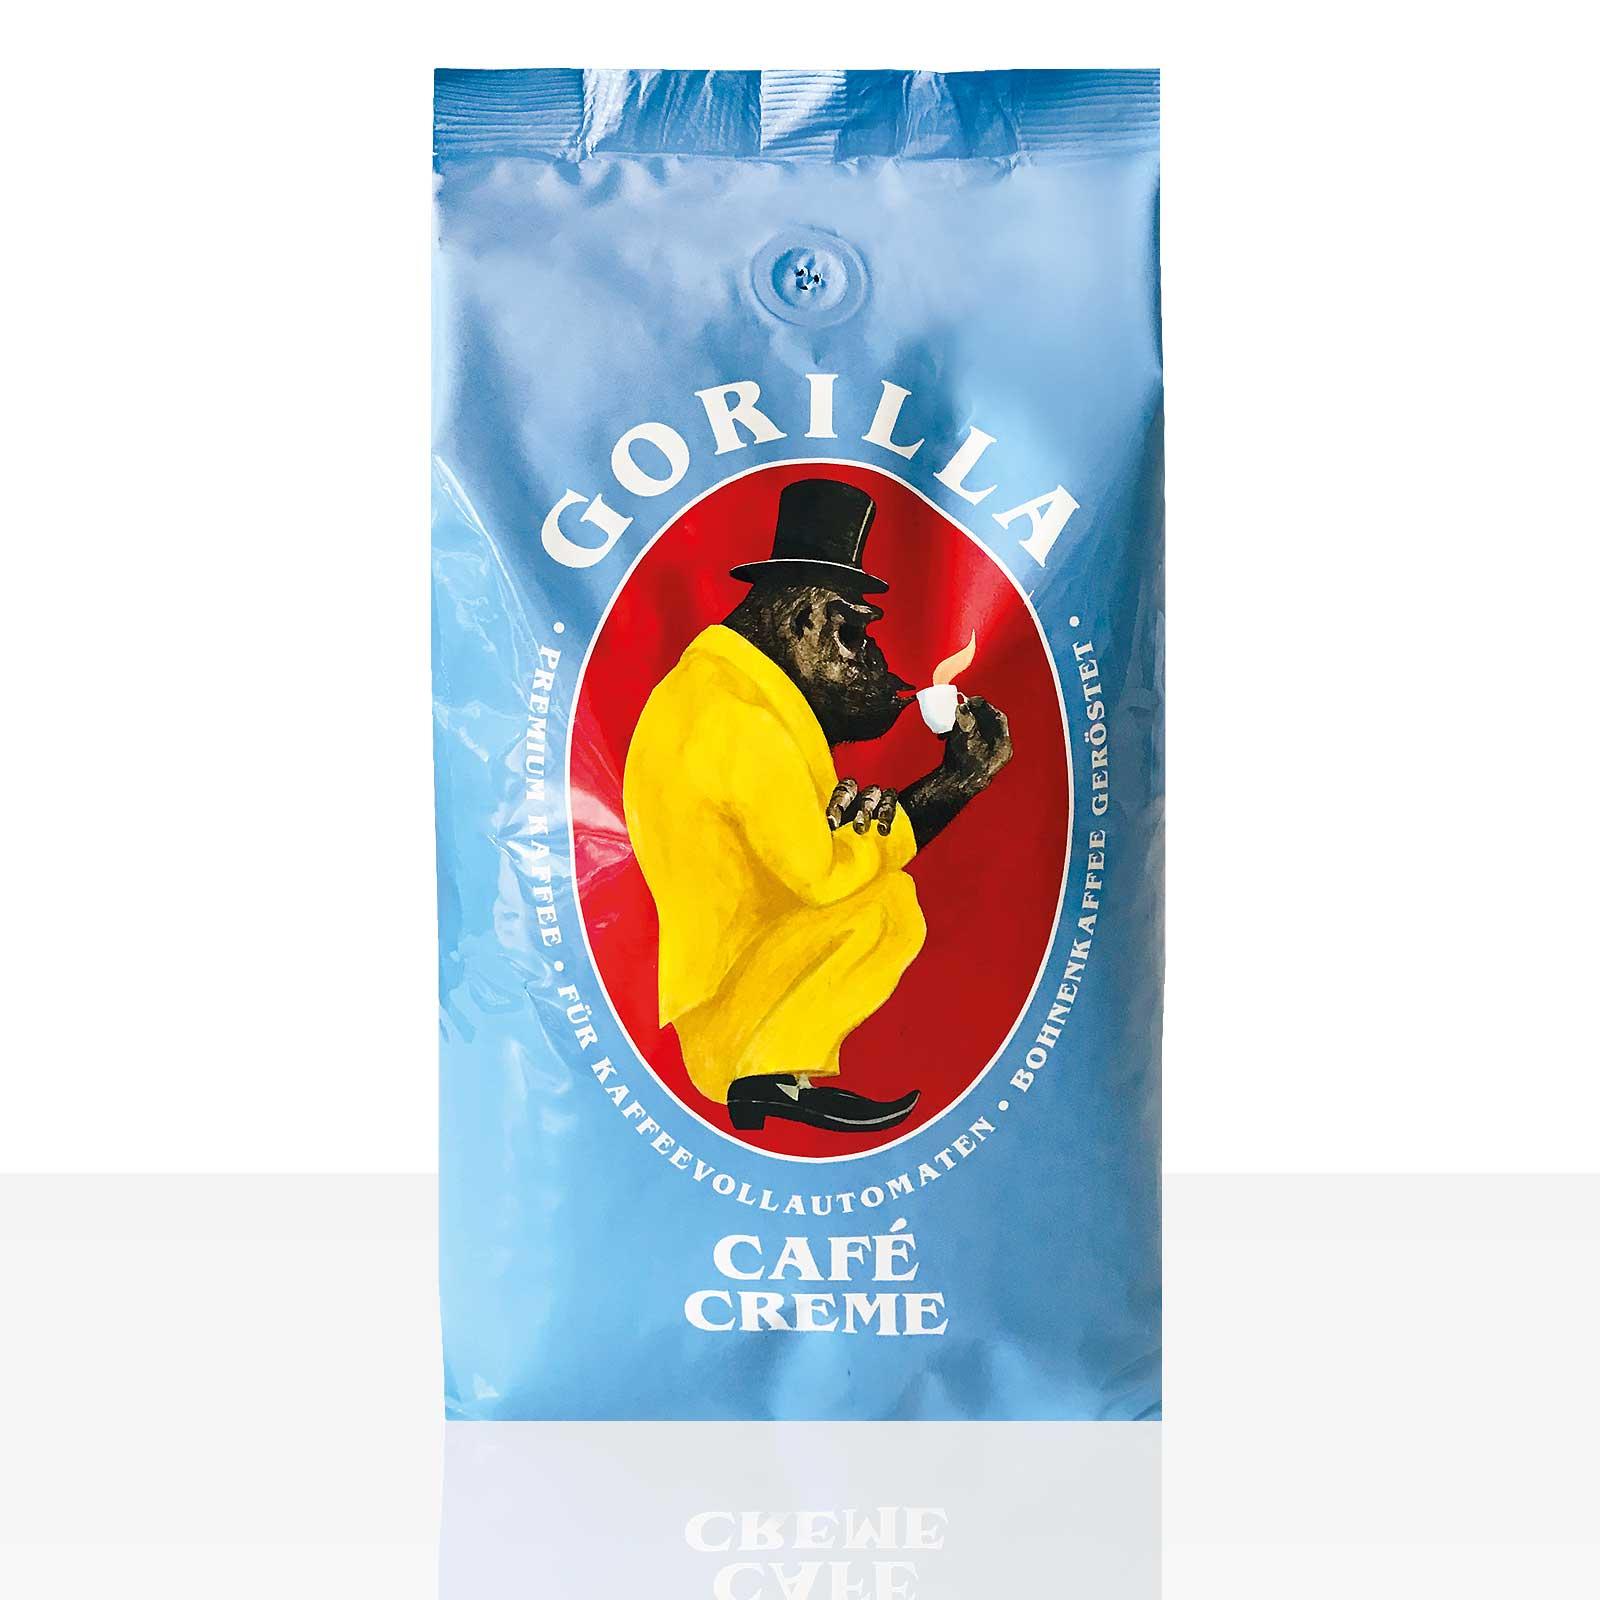 Gorilla Cafe Creme Kaffee 12 x 1kg ganze Bohne